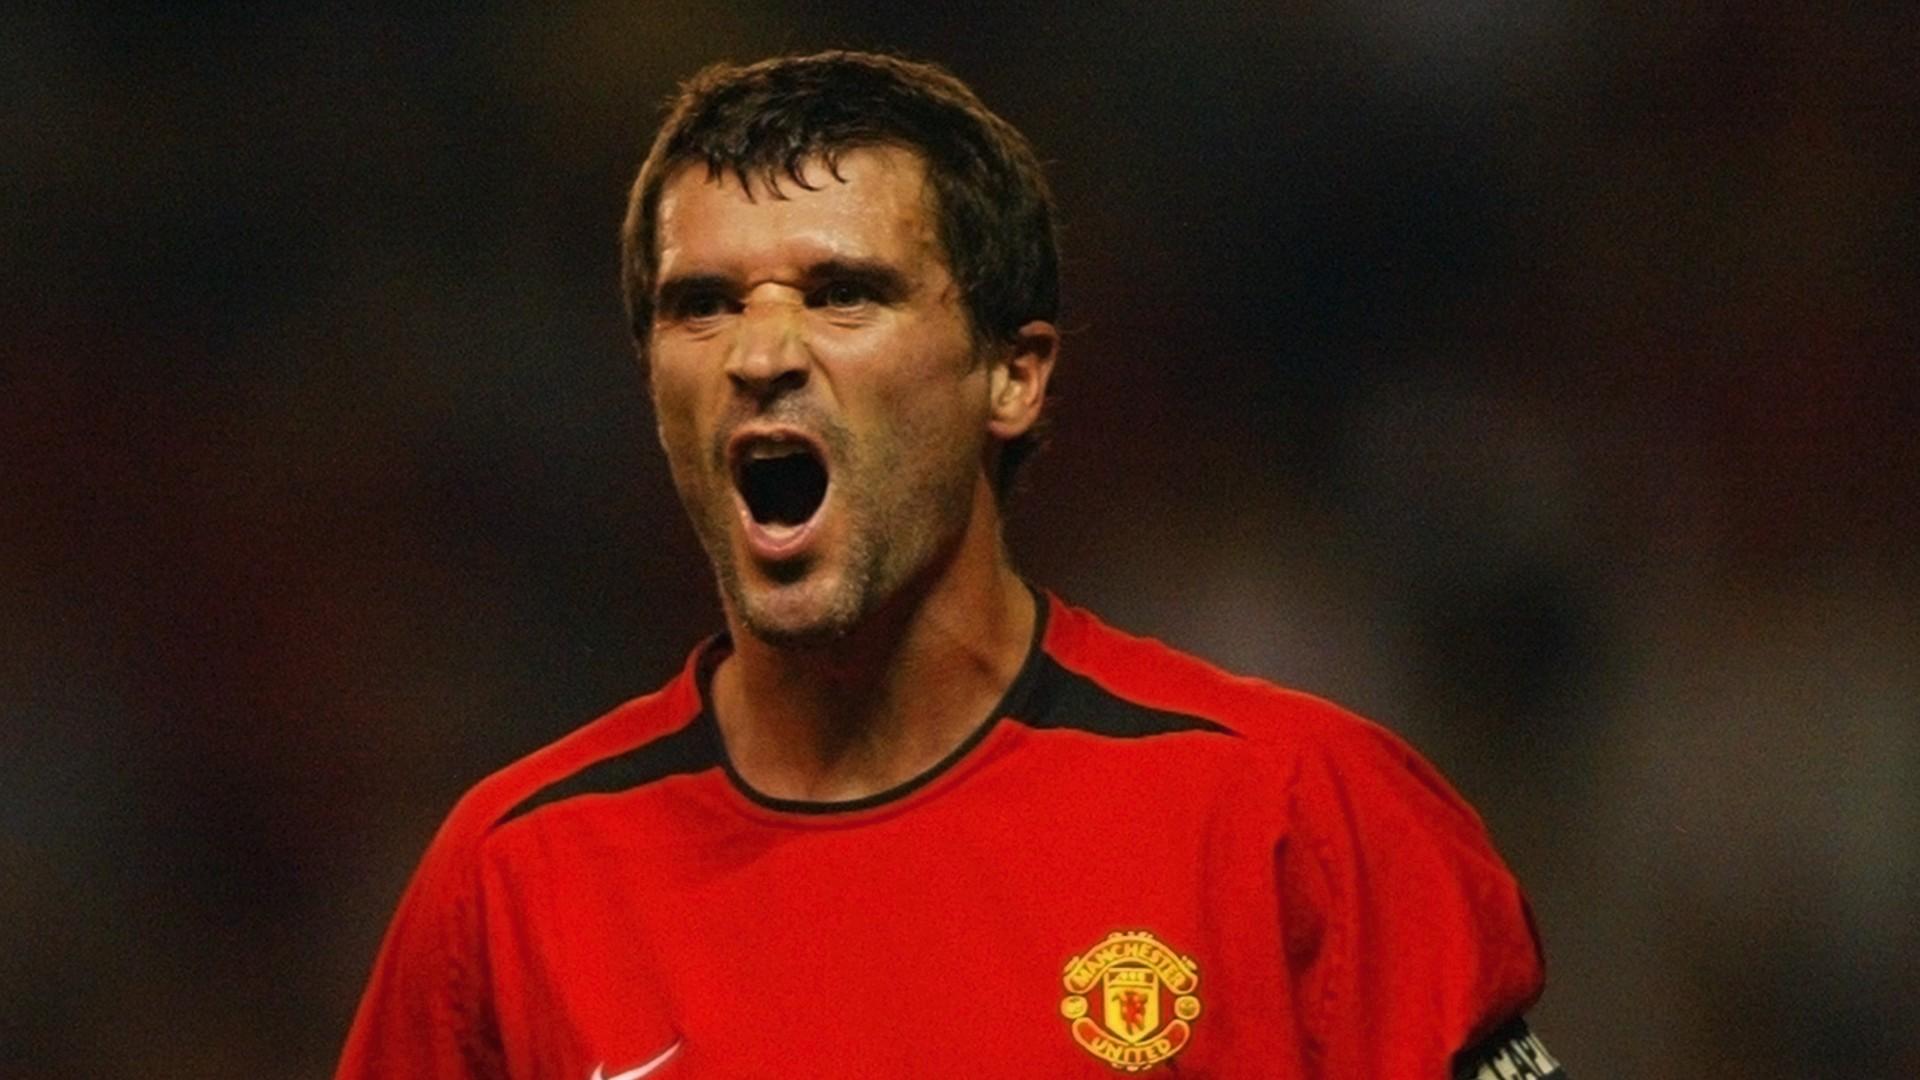 'Roy Keane takes no prisoners' – Paul McShane opens up on ex-Man Utd captain, Ferguson and inspiring the next generation